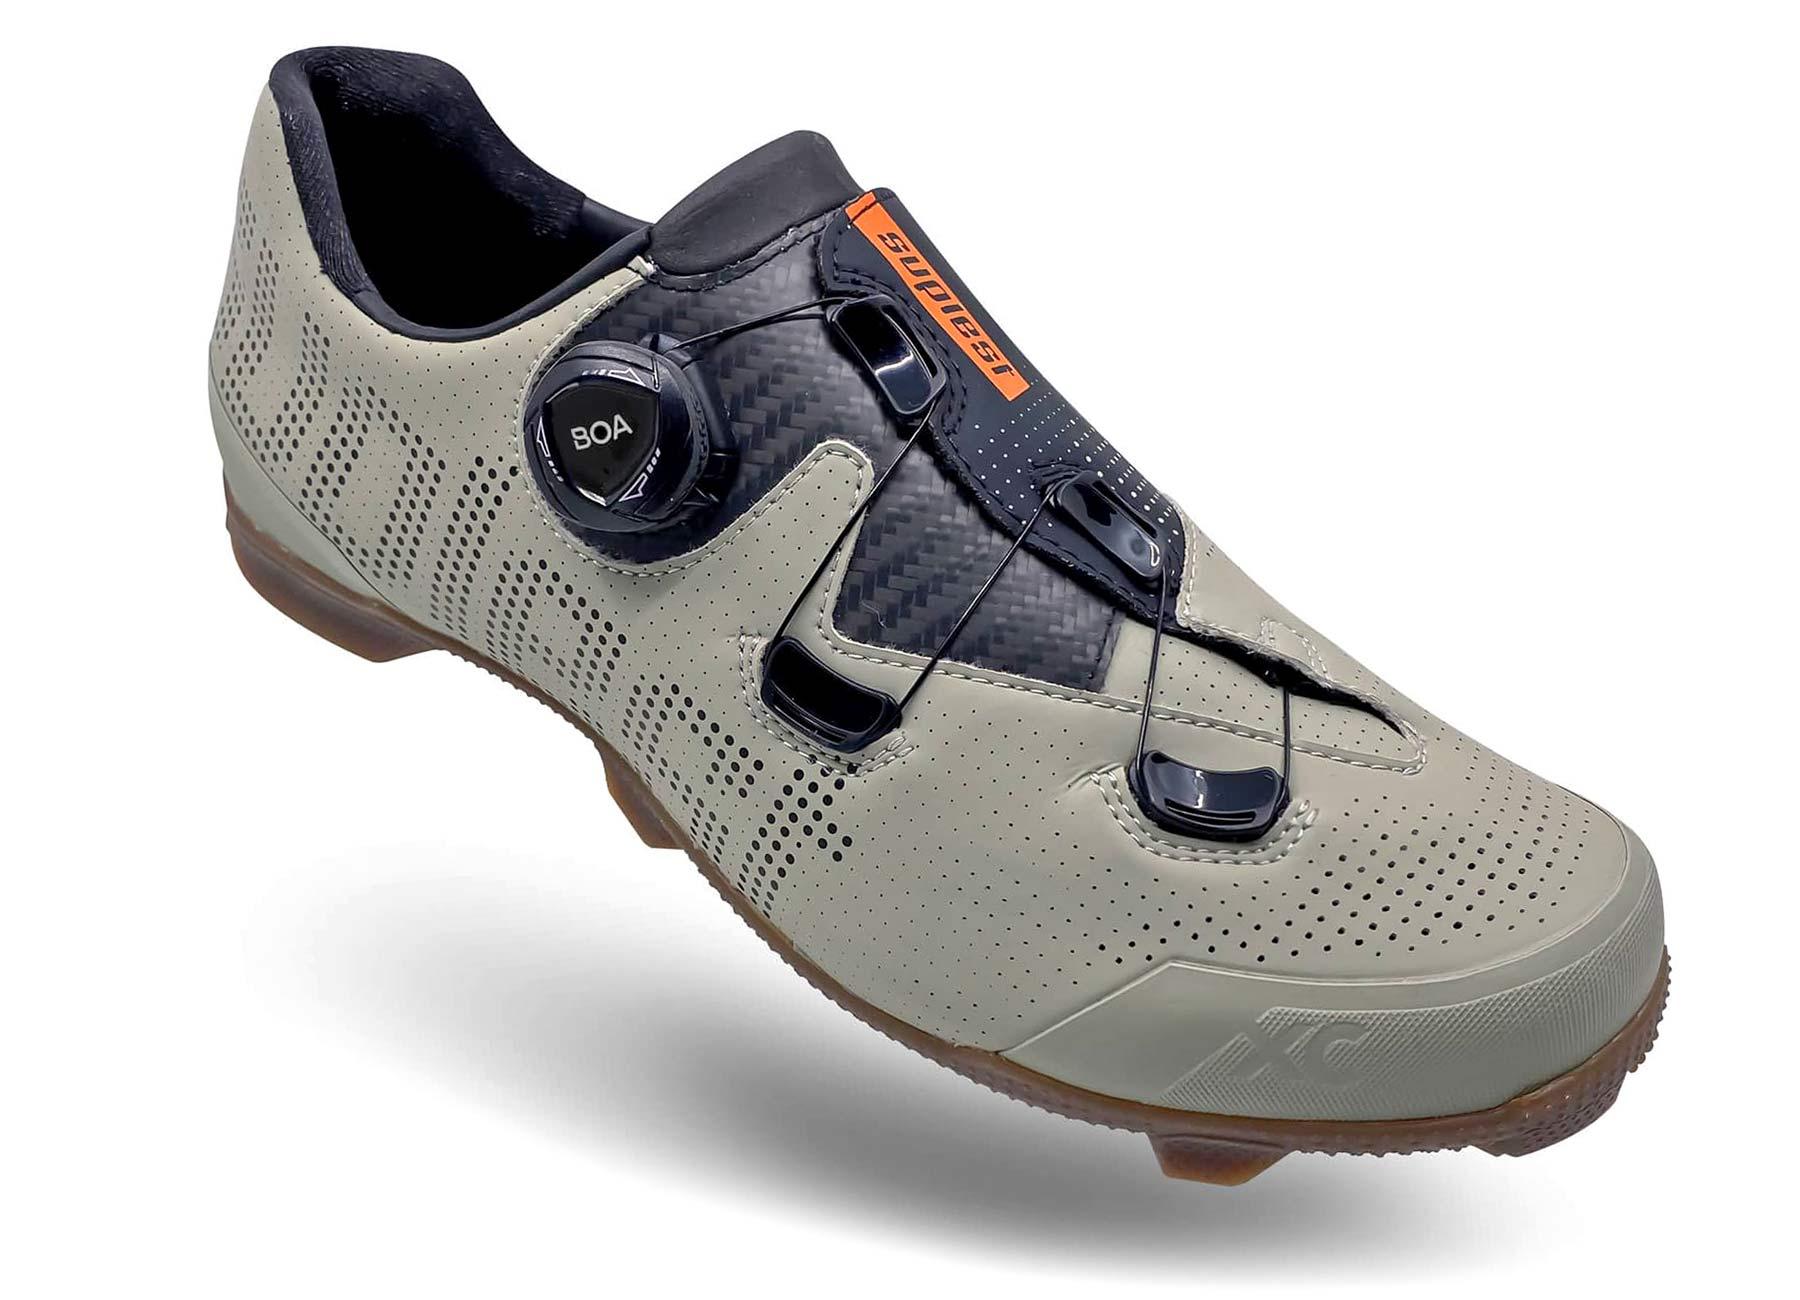 Suplest Gravel cycling shoe, OPEN-Suplest collaboration EDGEplus XC Gravel bike shoesSwiss Alpine gravel grey,angled